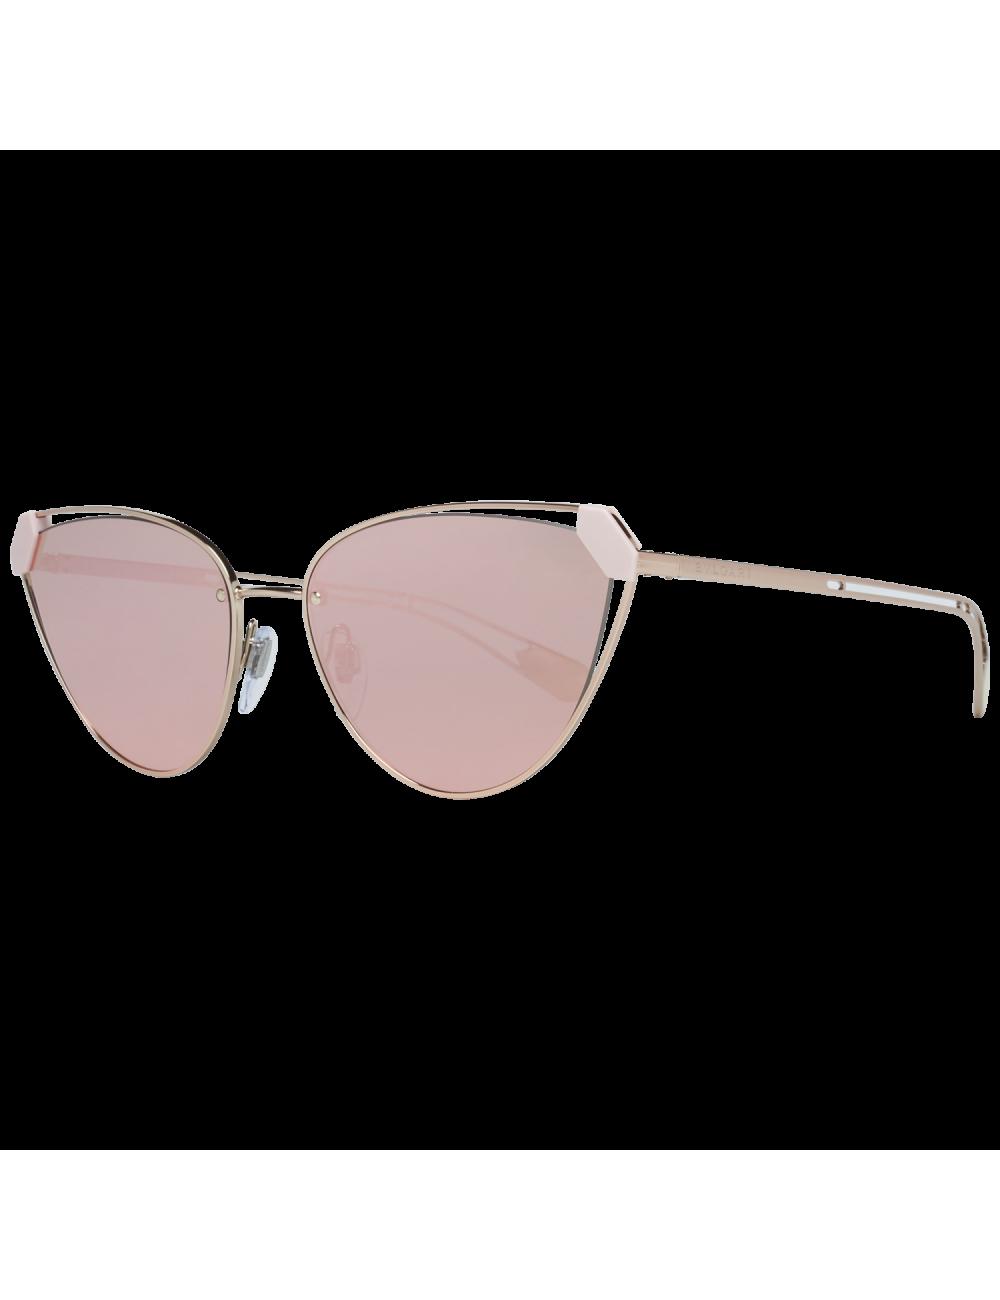 Bvlgari Sunglasses BV6115 20144Z 58